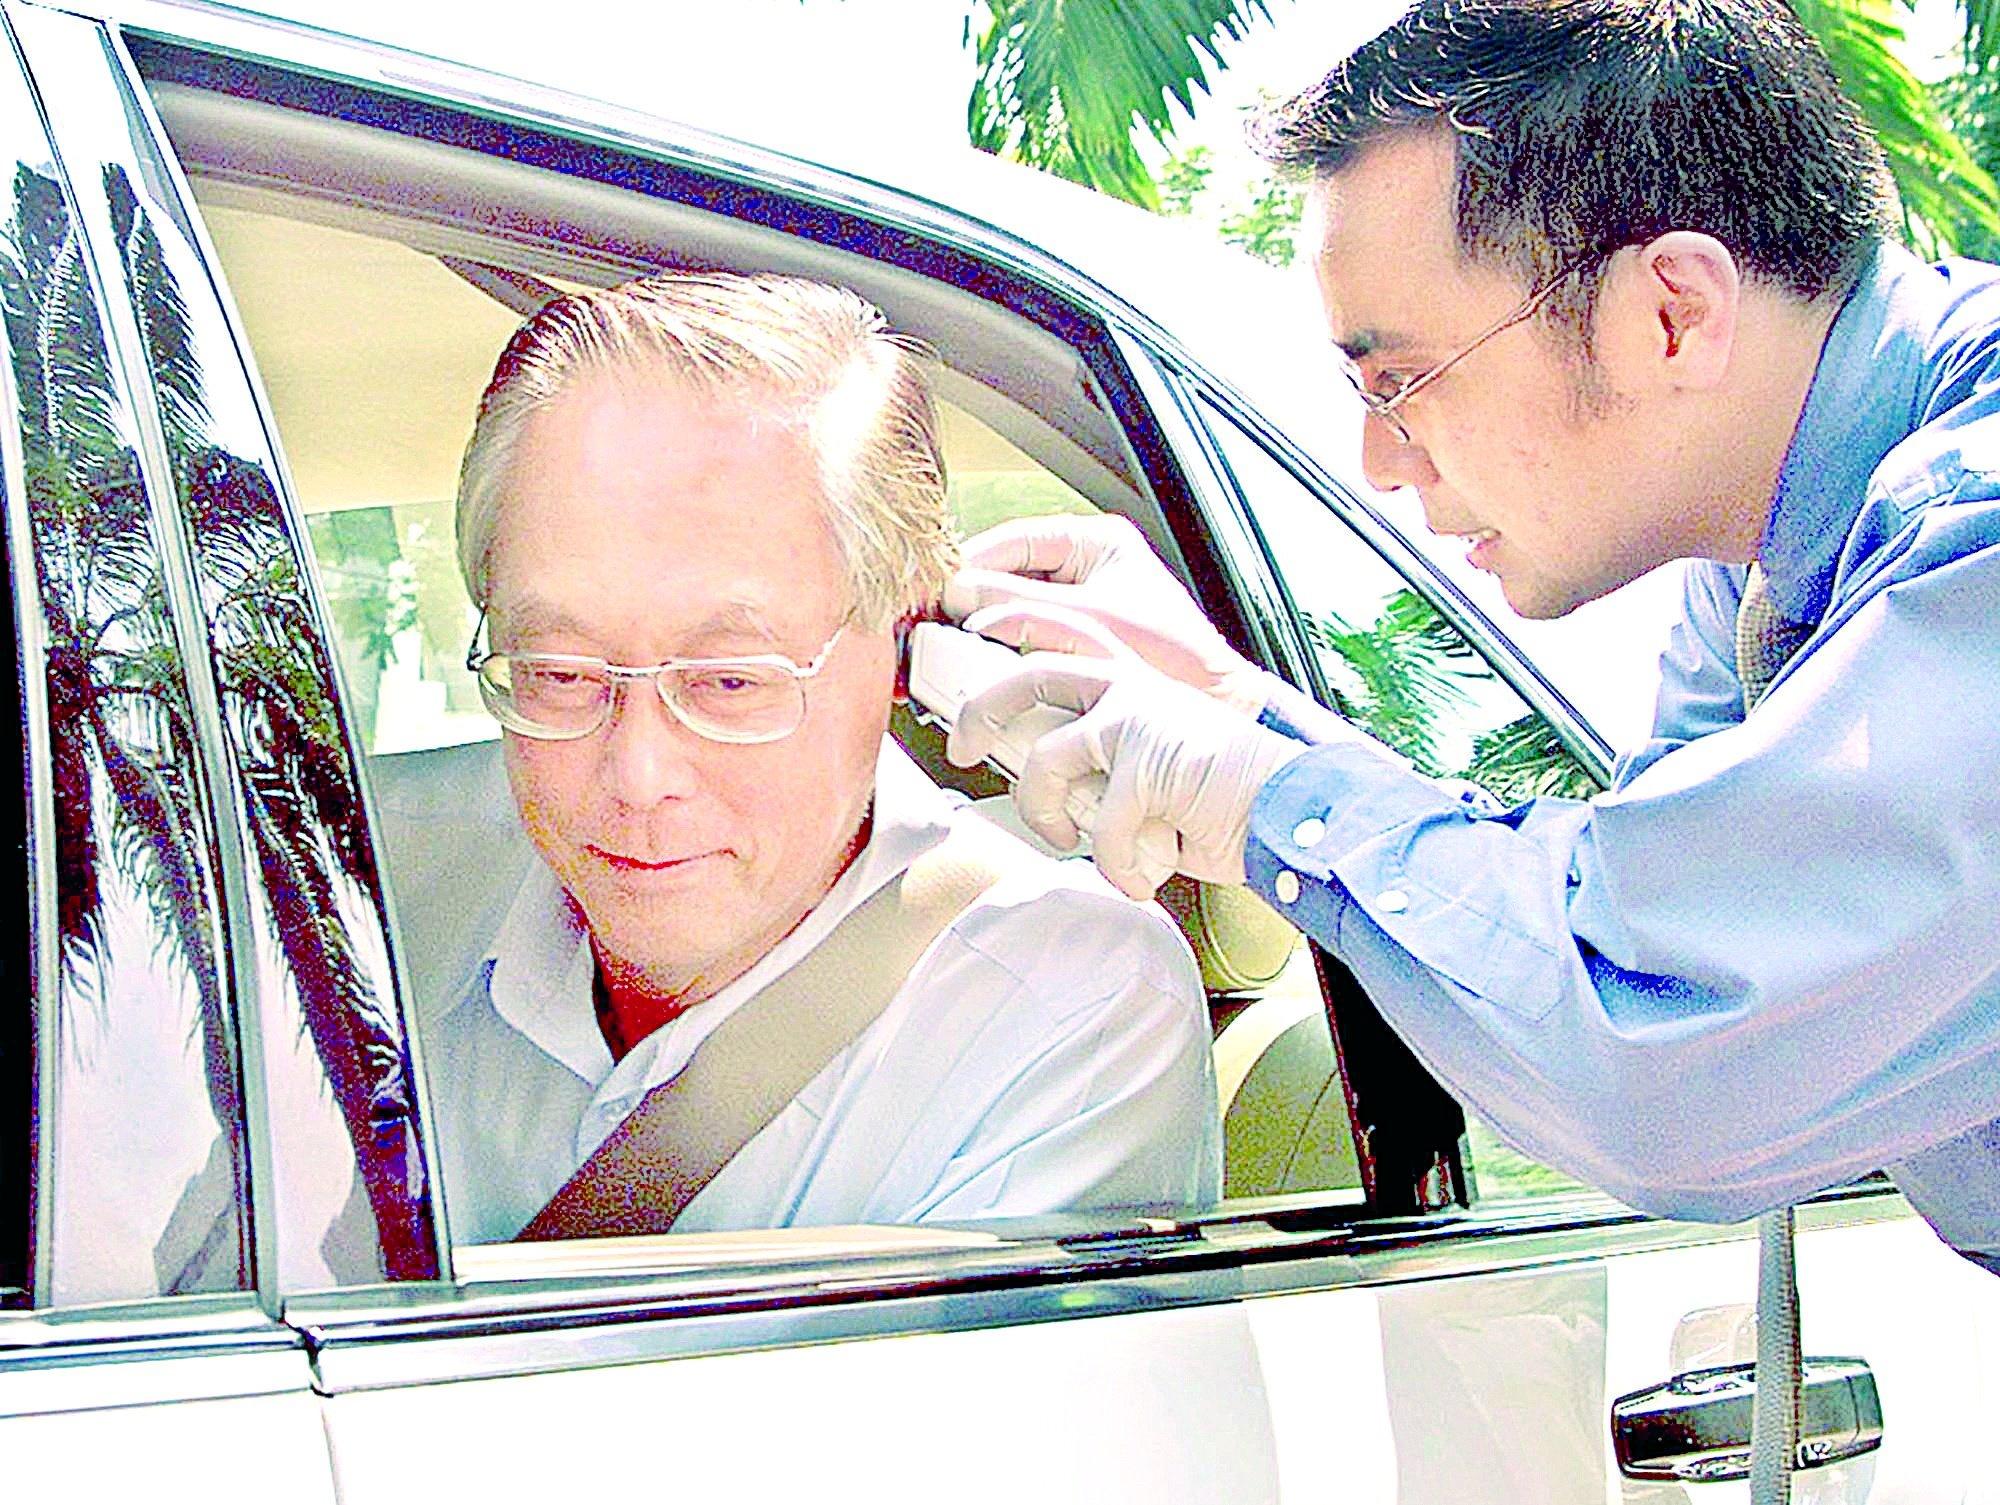 Singapore Prime Minister Goh Chok Tong gets his temperature taken outside of parliament on April 24, 2003. (AP Photo)